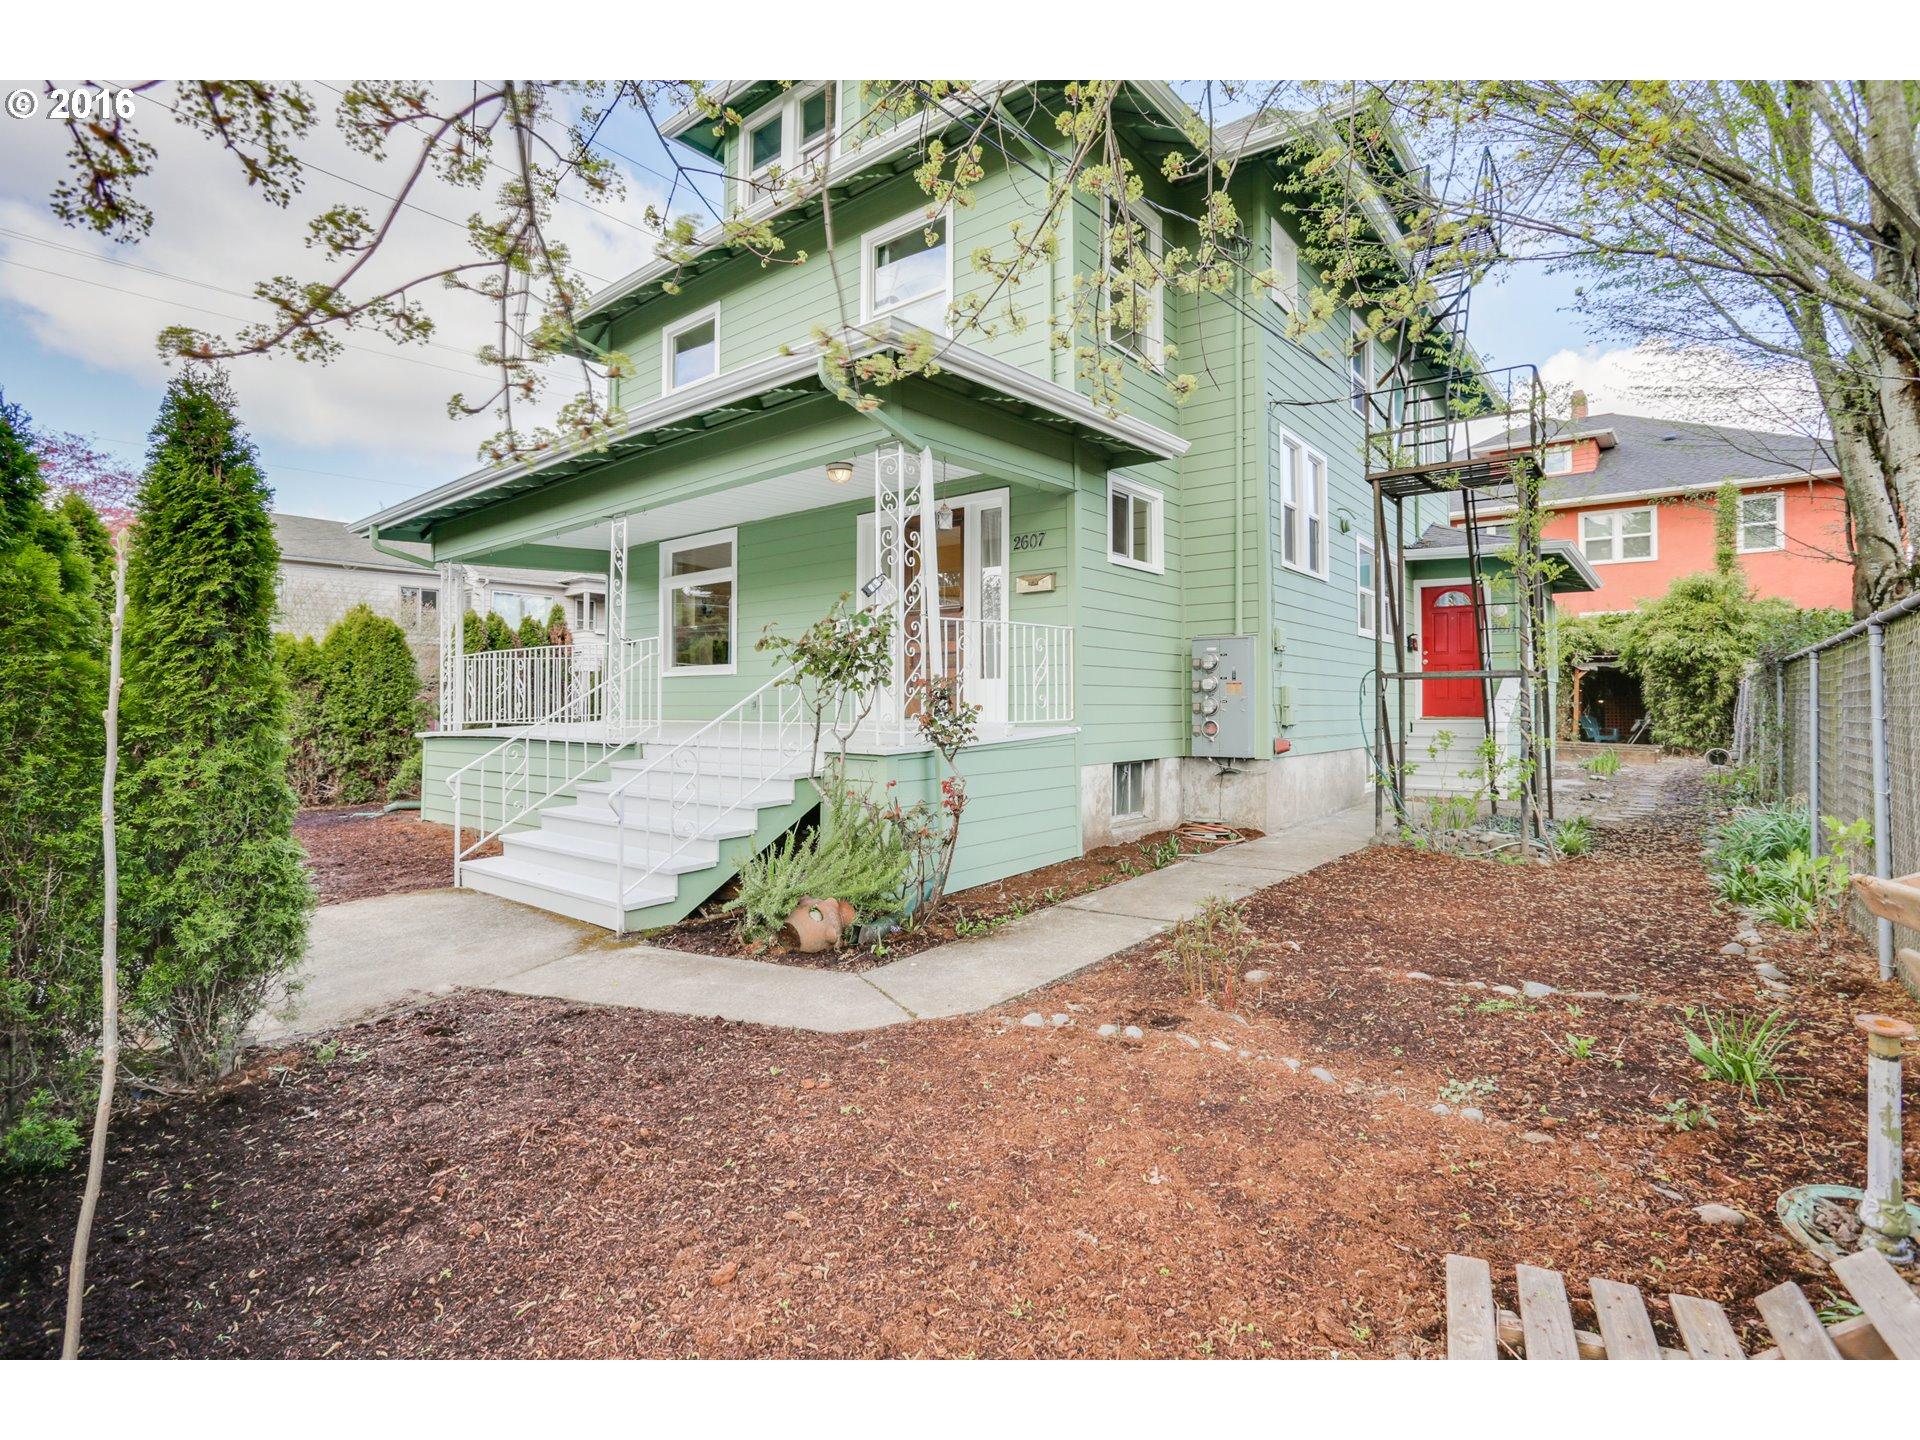 $625,000 - Br/Ba -  for Sale in Sullivans Gulch, Portland